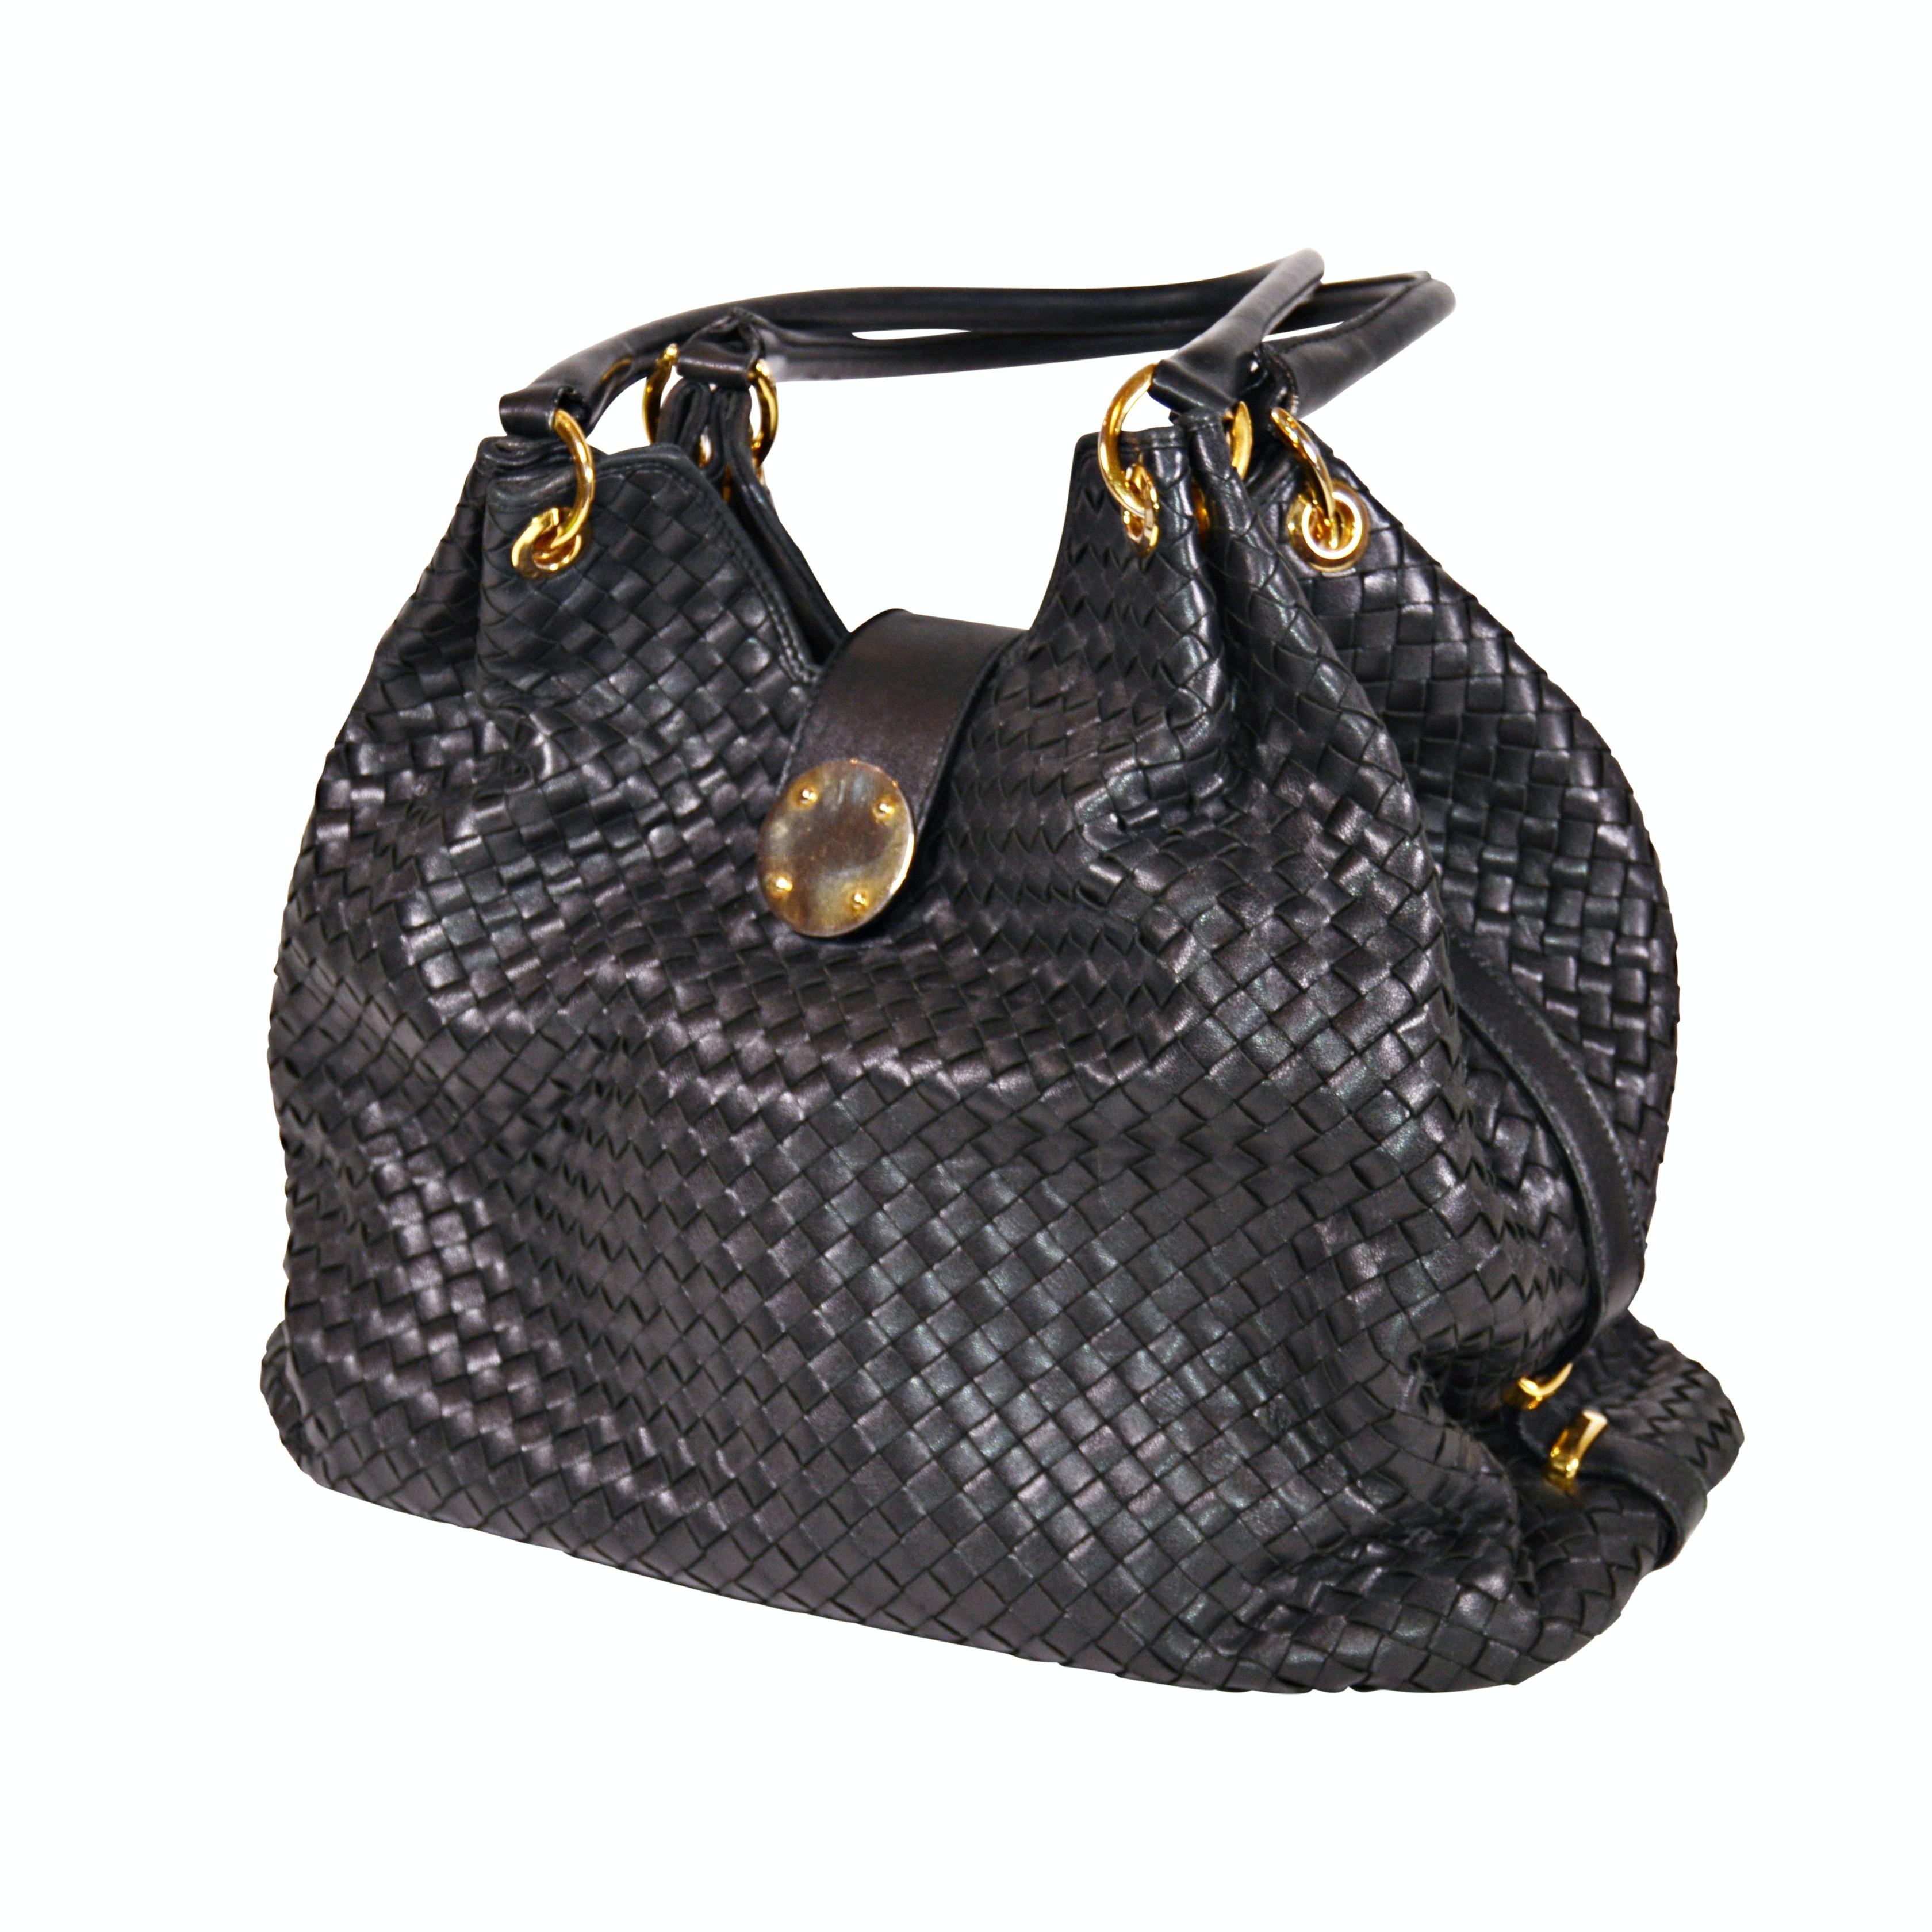 LALO Italian Black Woven Leather Satchel